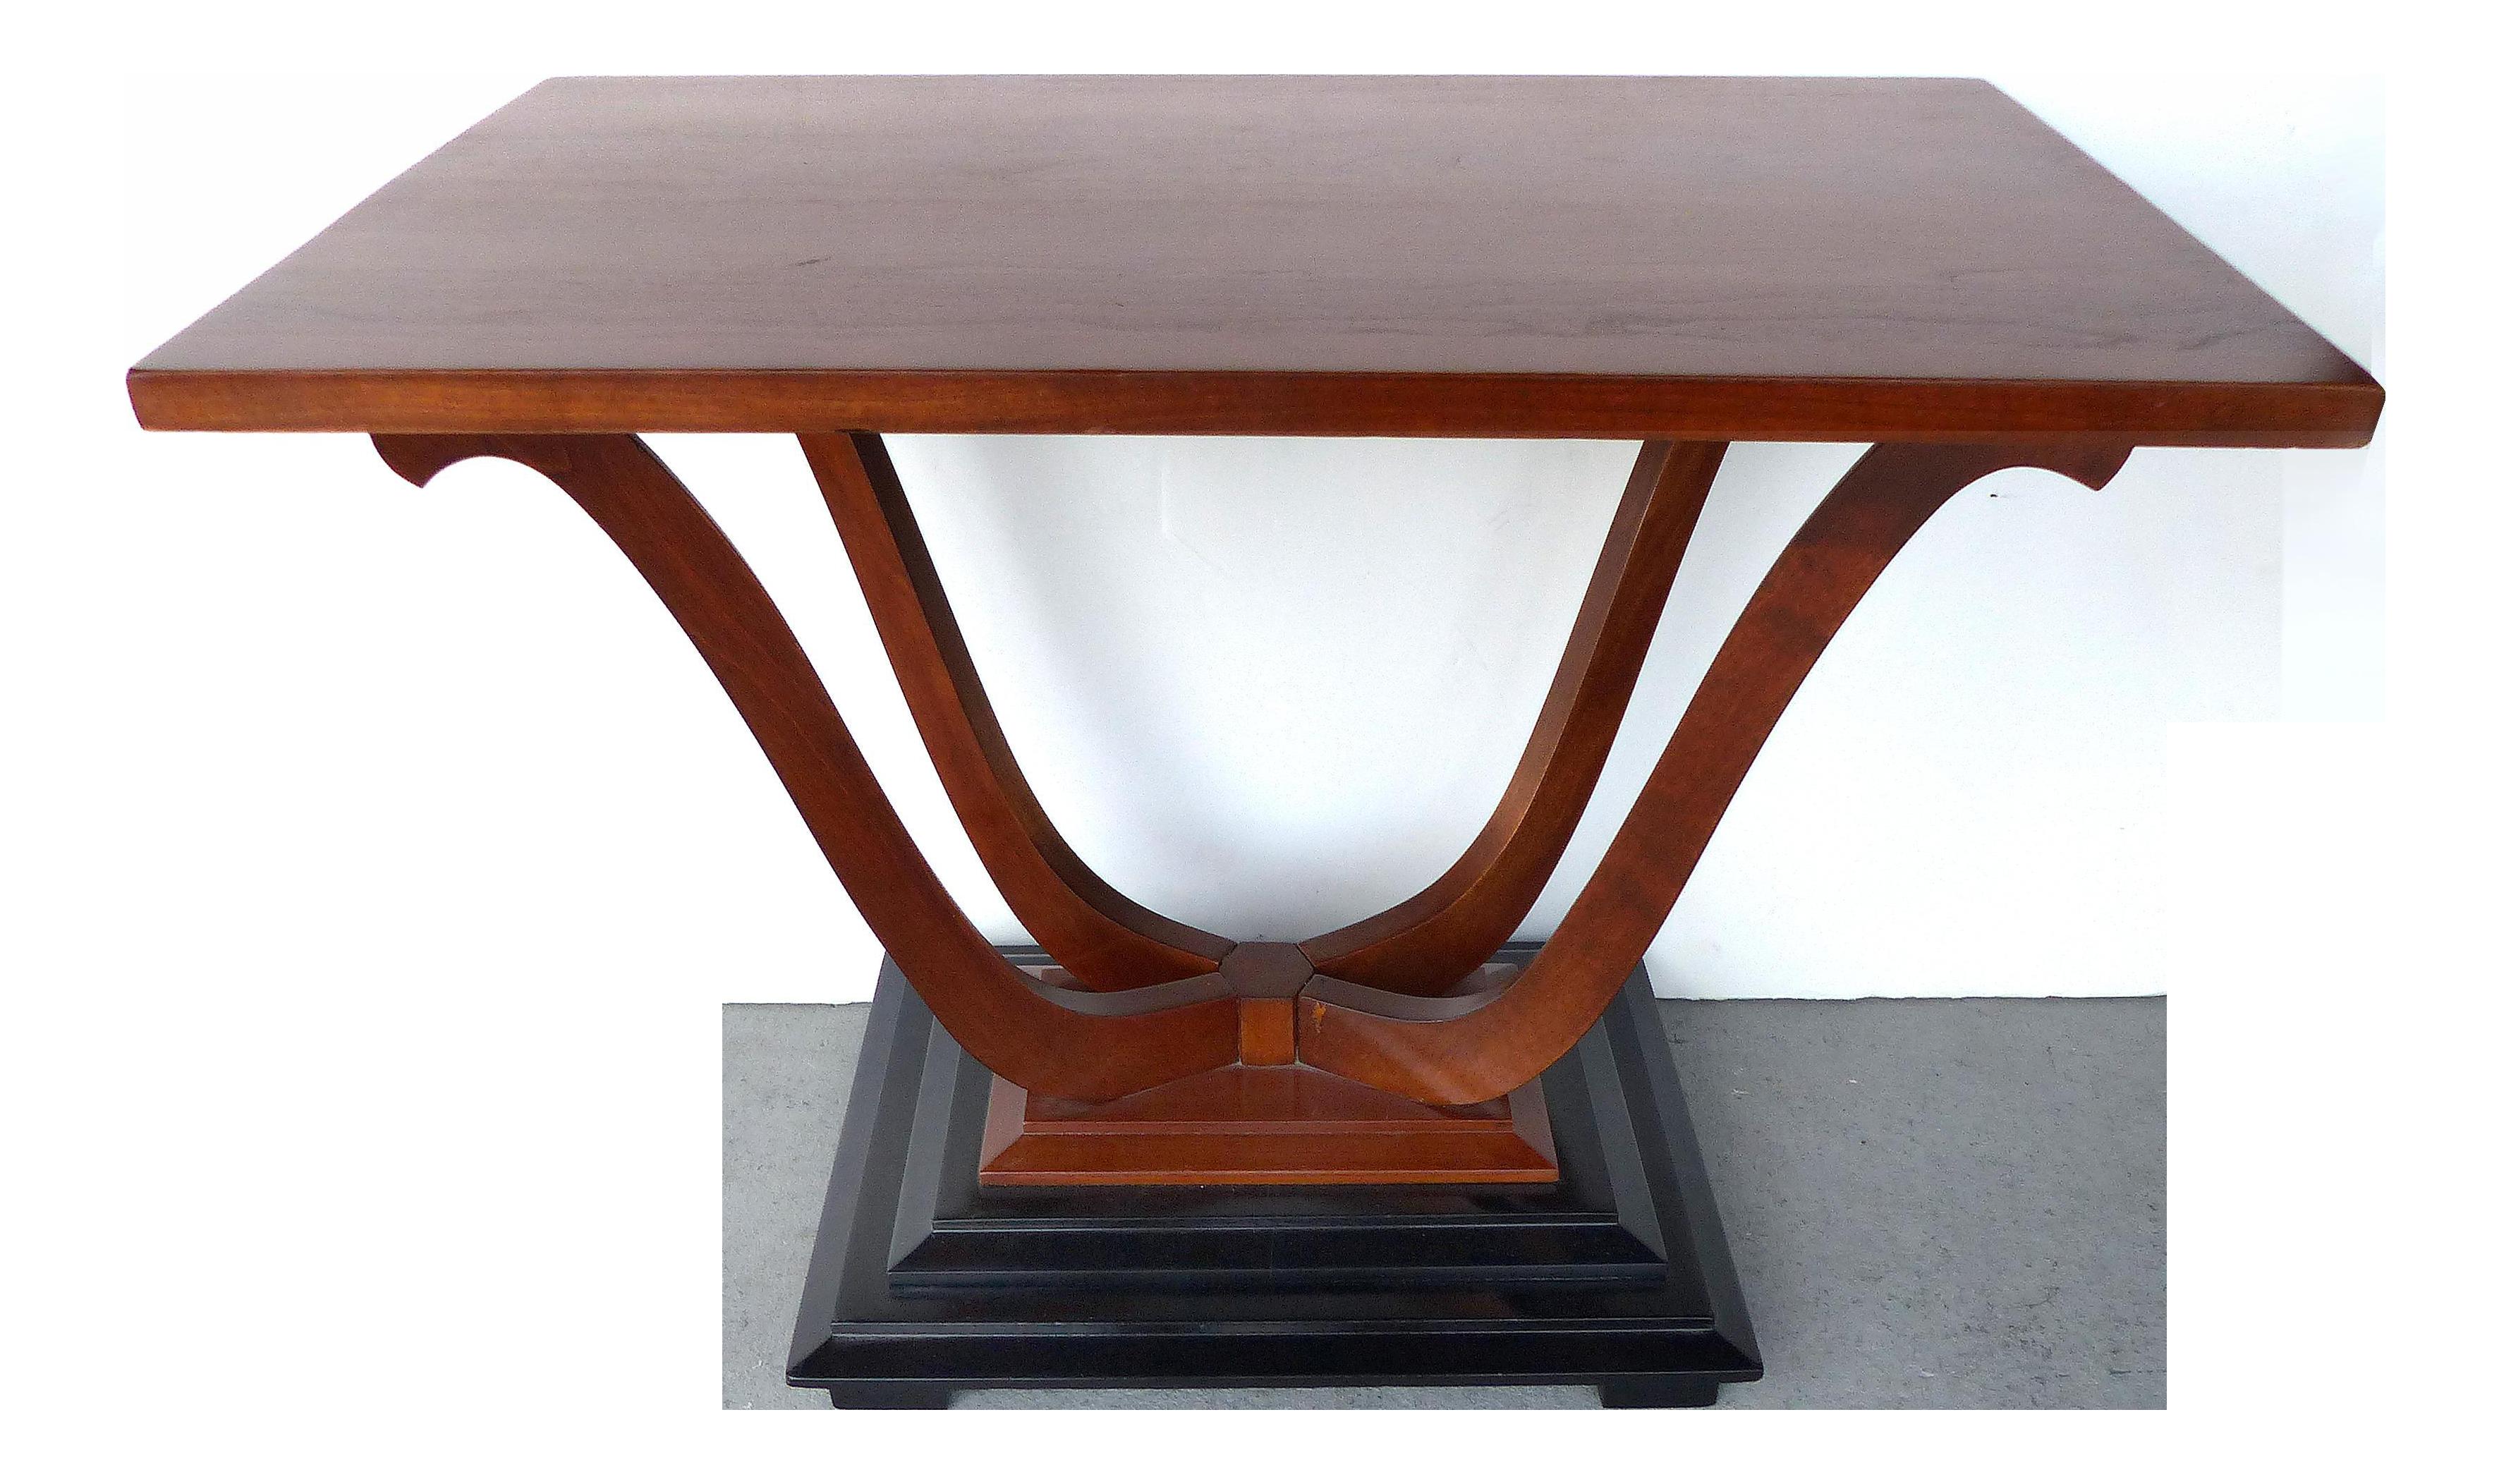 Good Johnson Furniture Art Deco Coffee Table